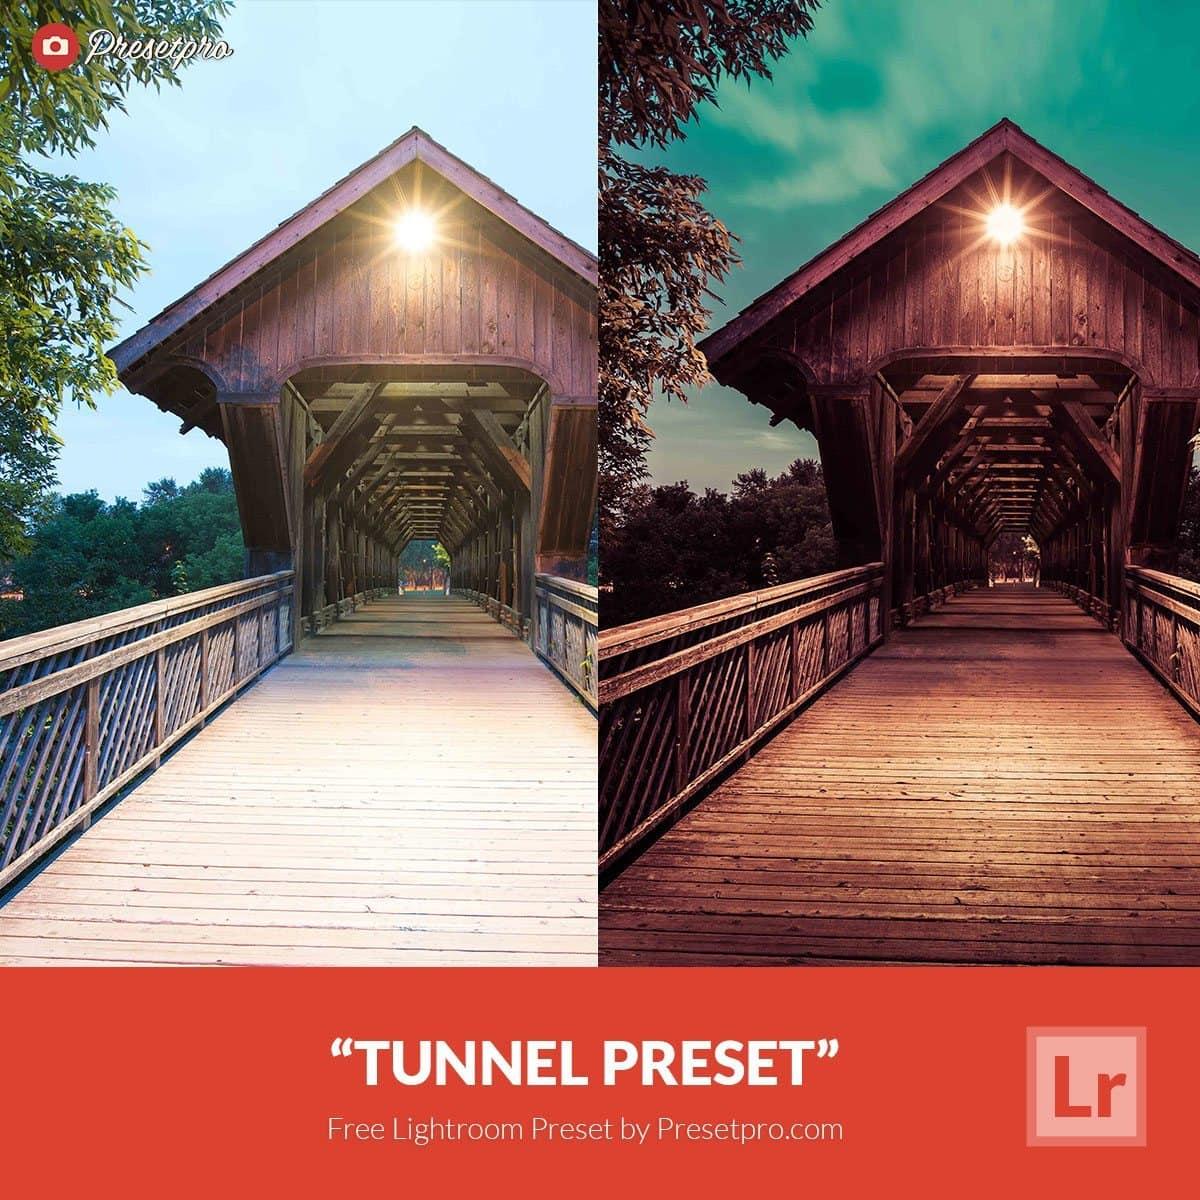 Presetpro Free Lightroom Preset Tunnel